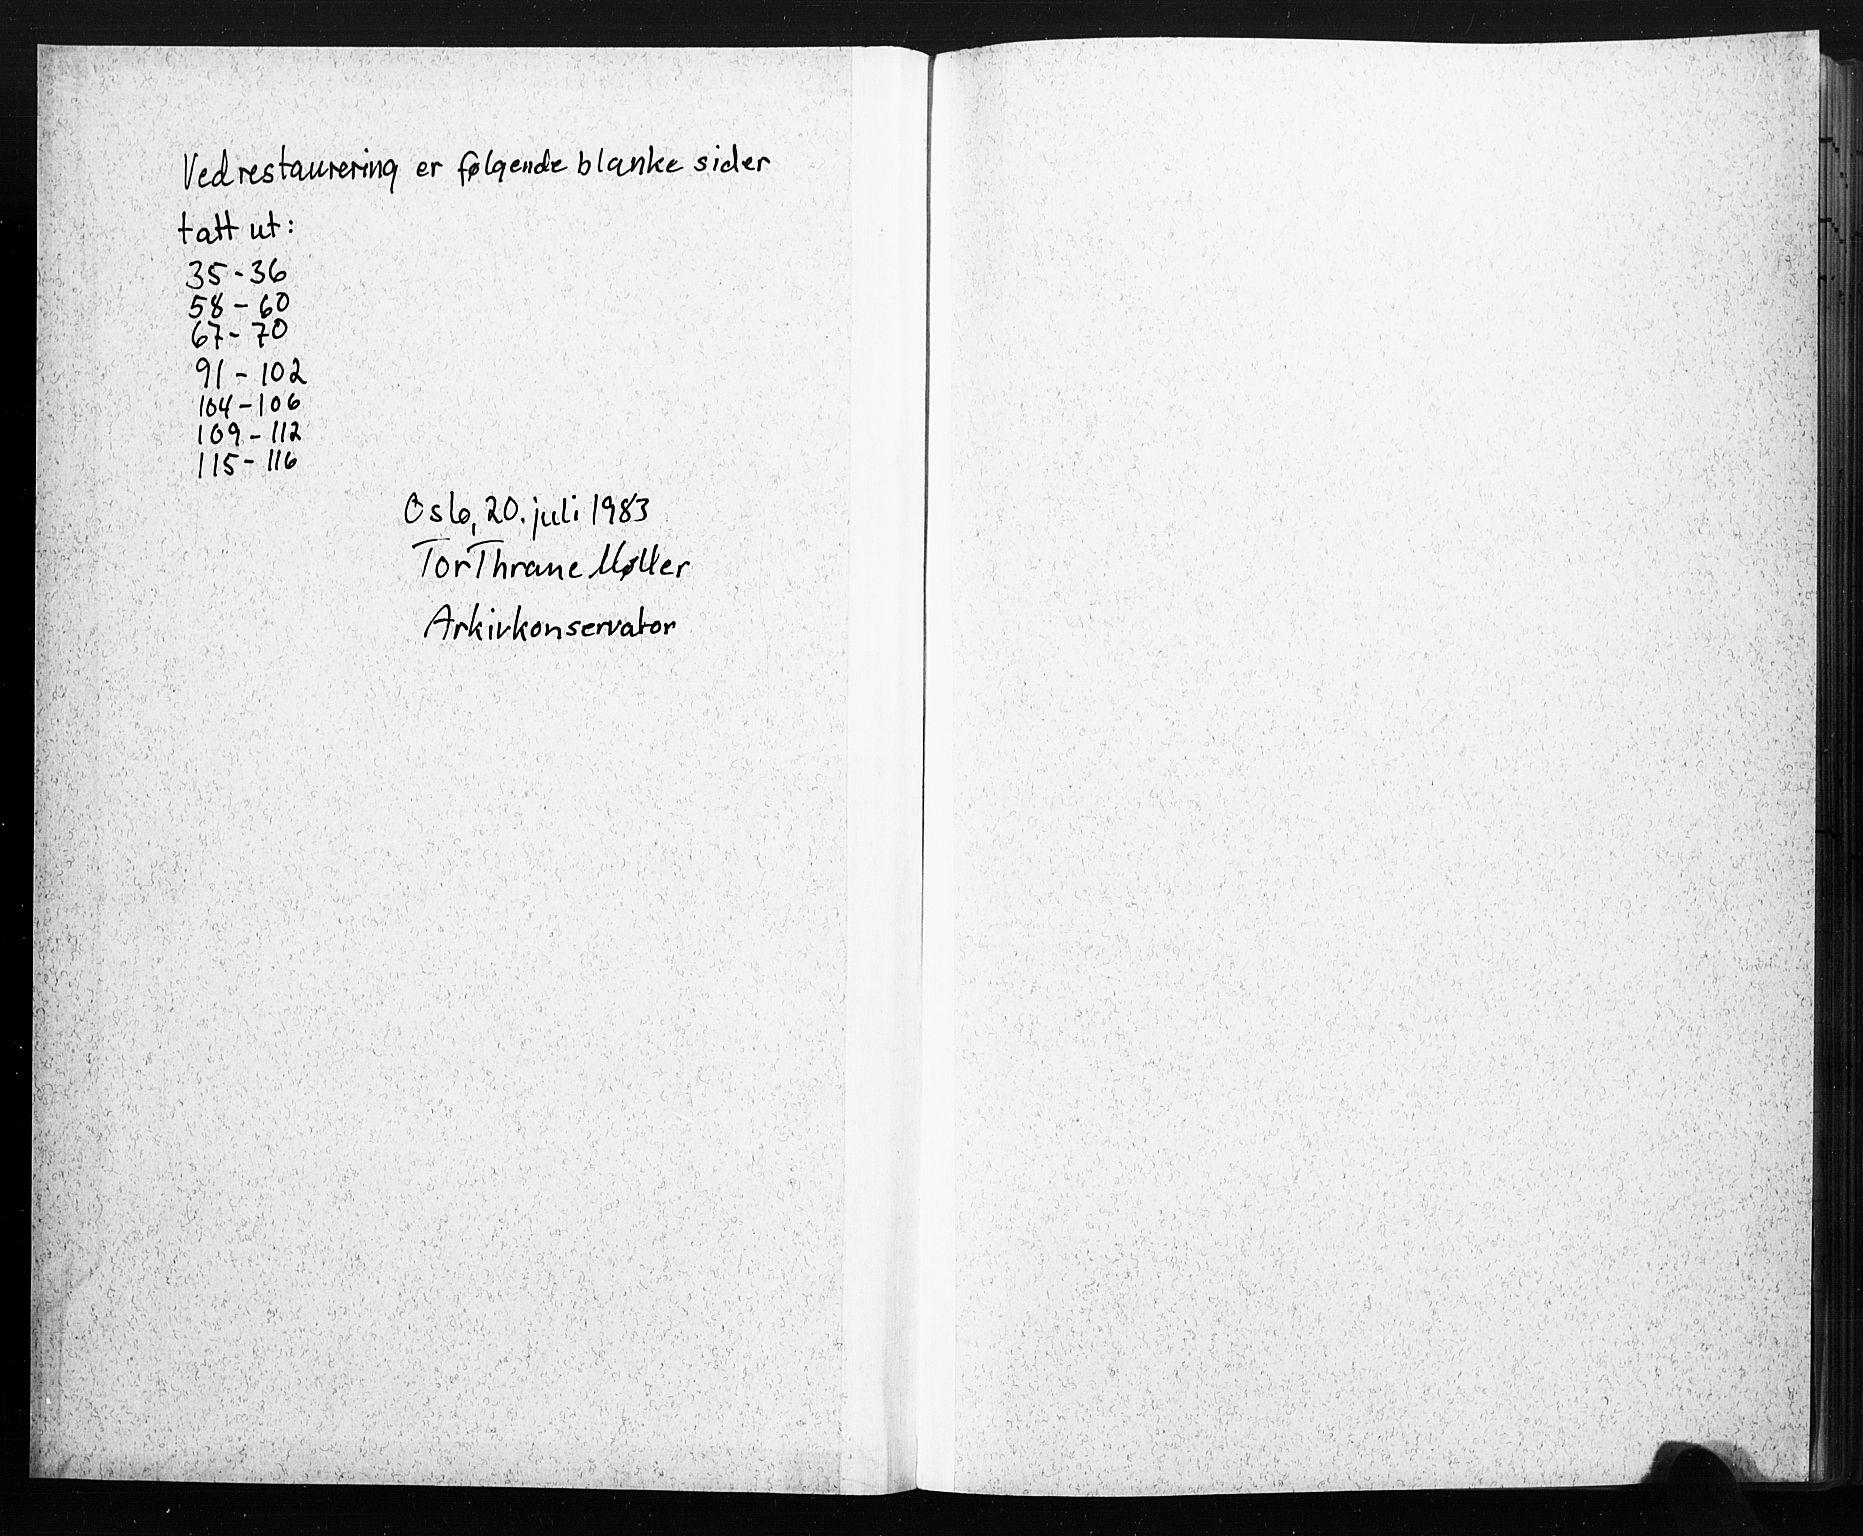 SAKO, Lårdal kirkebøker, F/Fc/L0002: Ministerialbok nr. III 2, 1887-1906